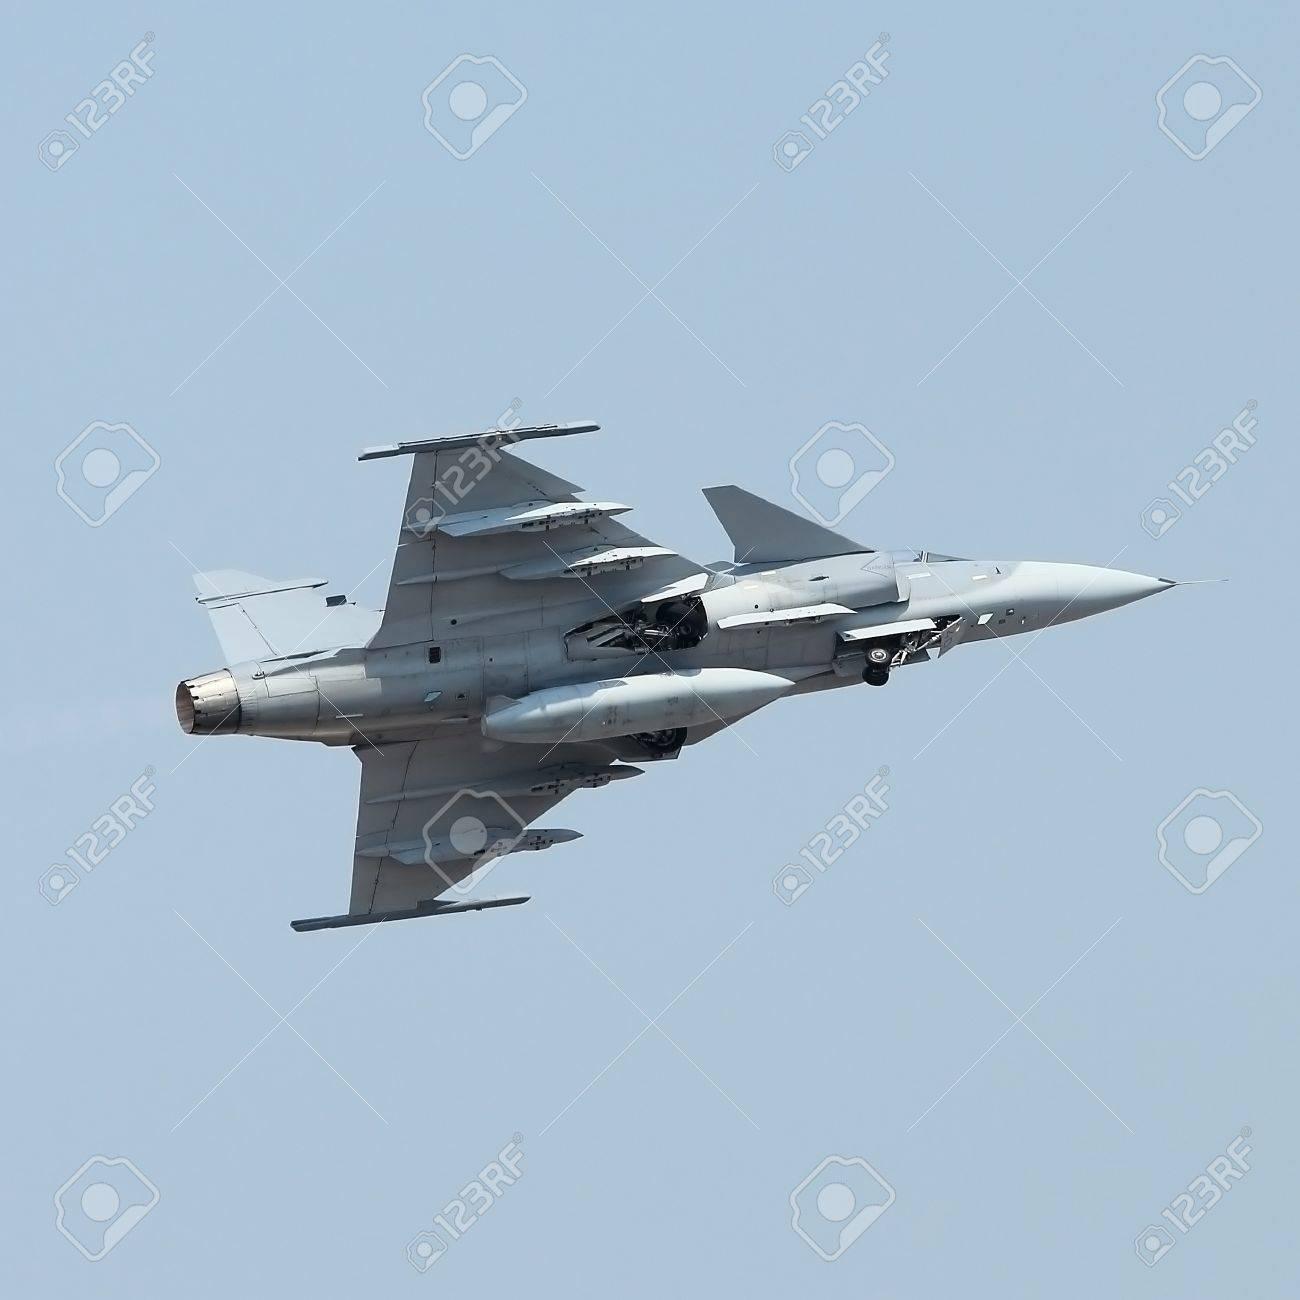 空気軍用機 の写真素材・画像素...